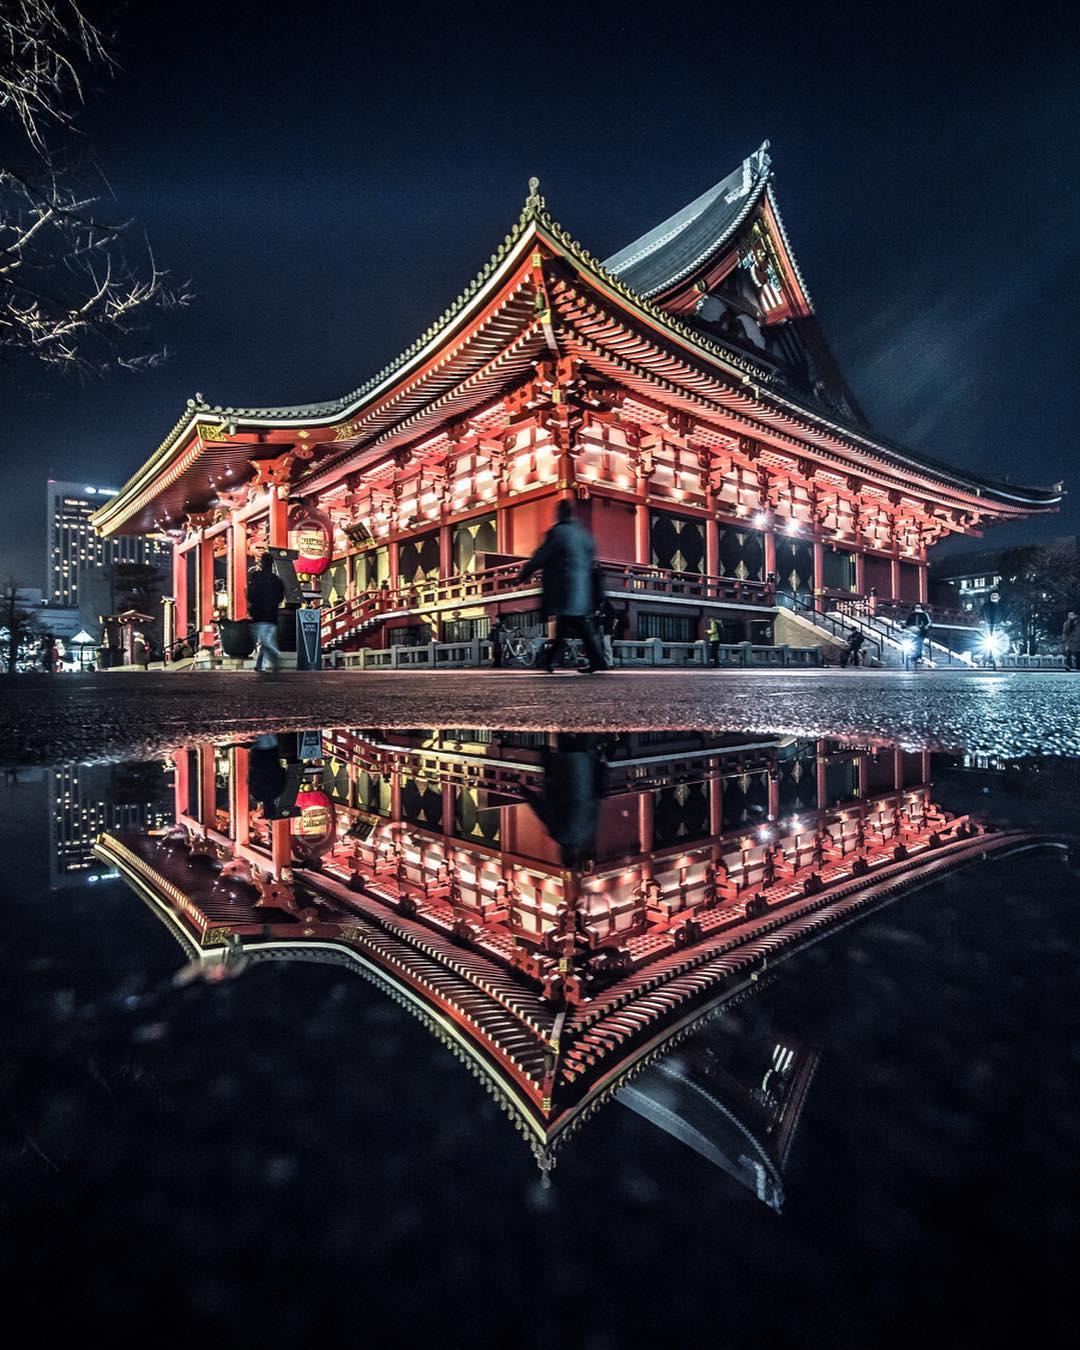 Tokyo Nightlife Photography by Hosokawa Ryohei